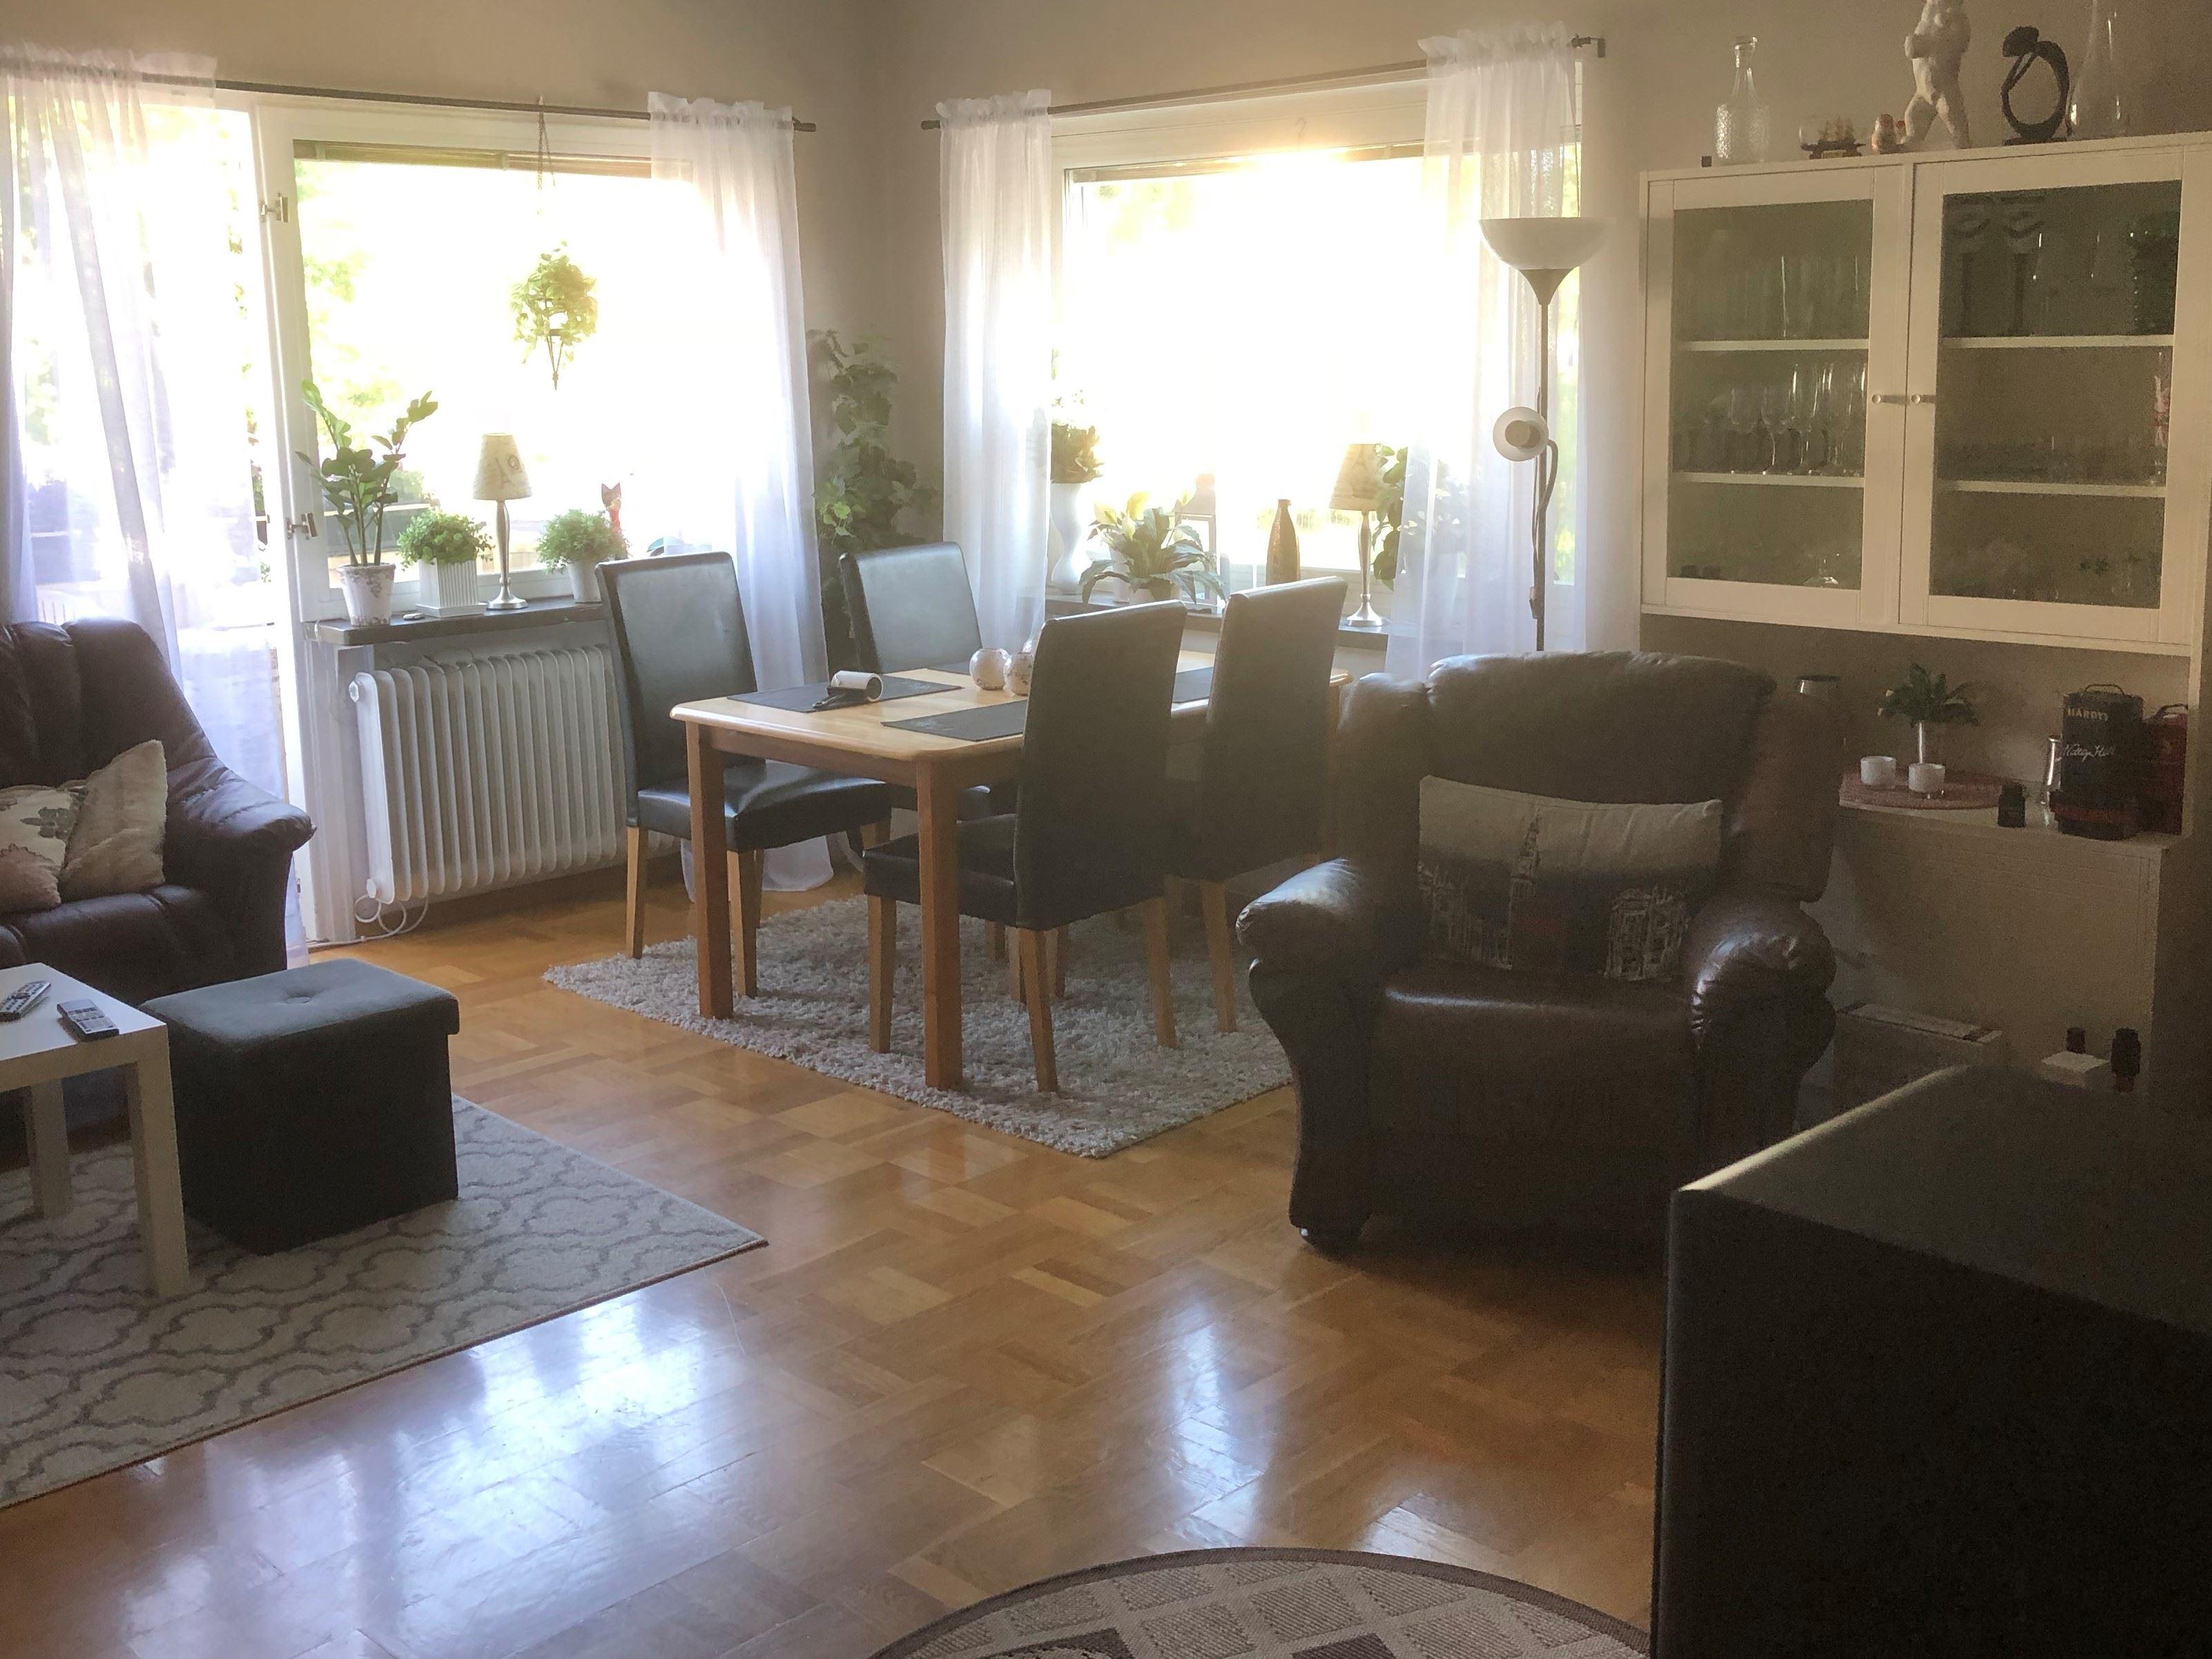 HL215 Apartment in Östersund